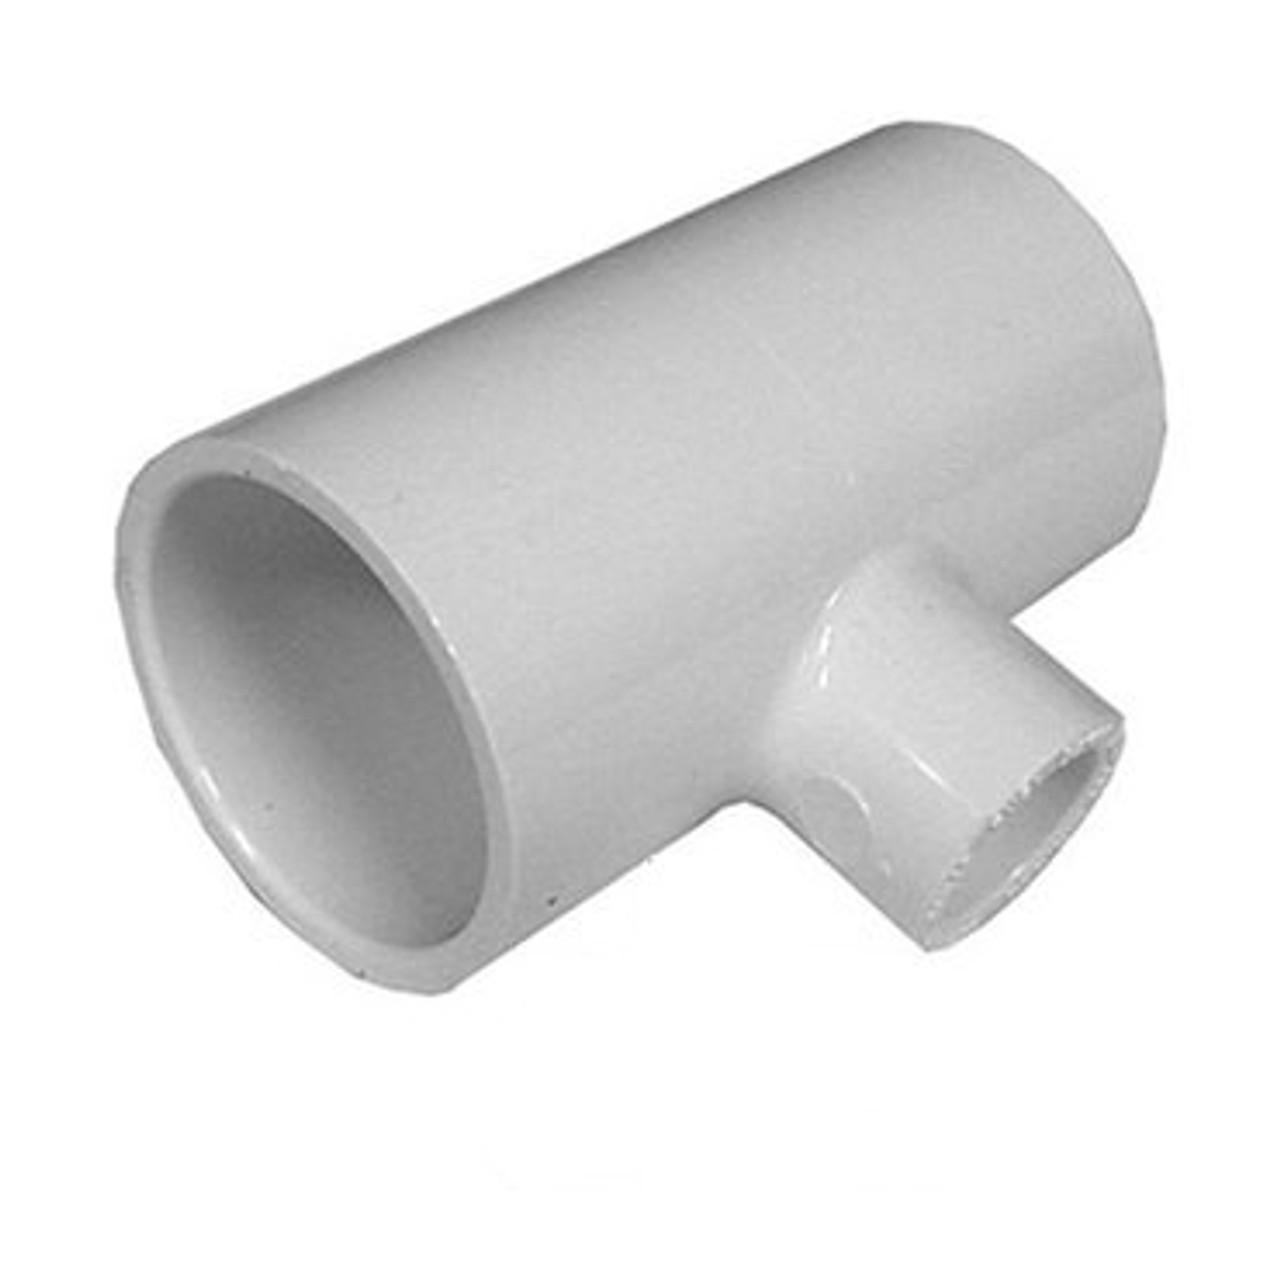 "Dura PVC Schedule 40 Slip Reducing Tee 1/"" x 3//4/"" x 1/"" Fitting"